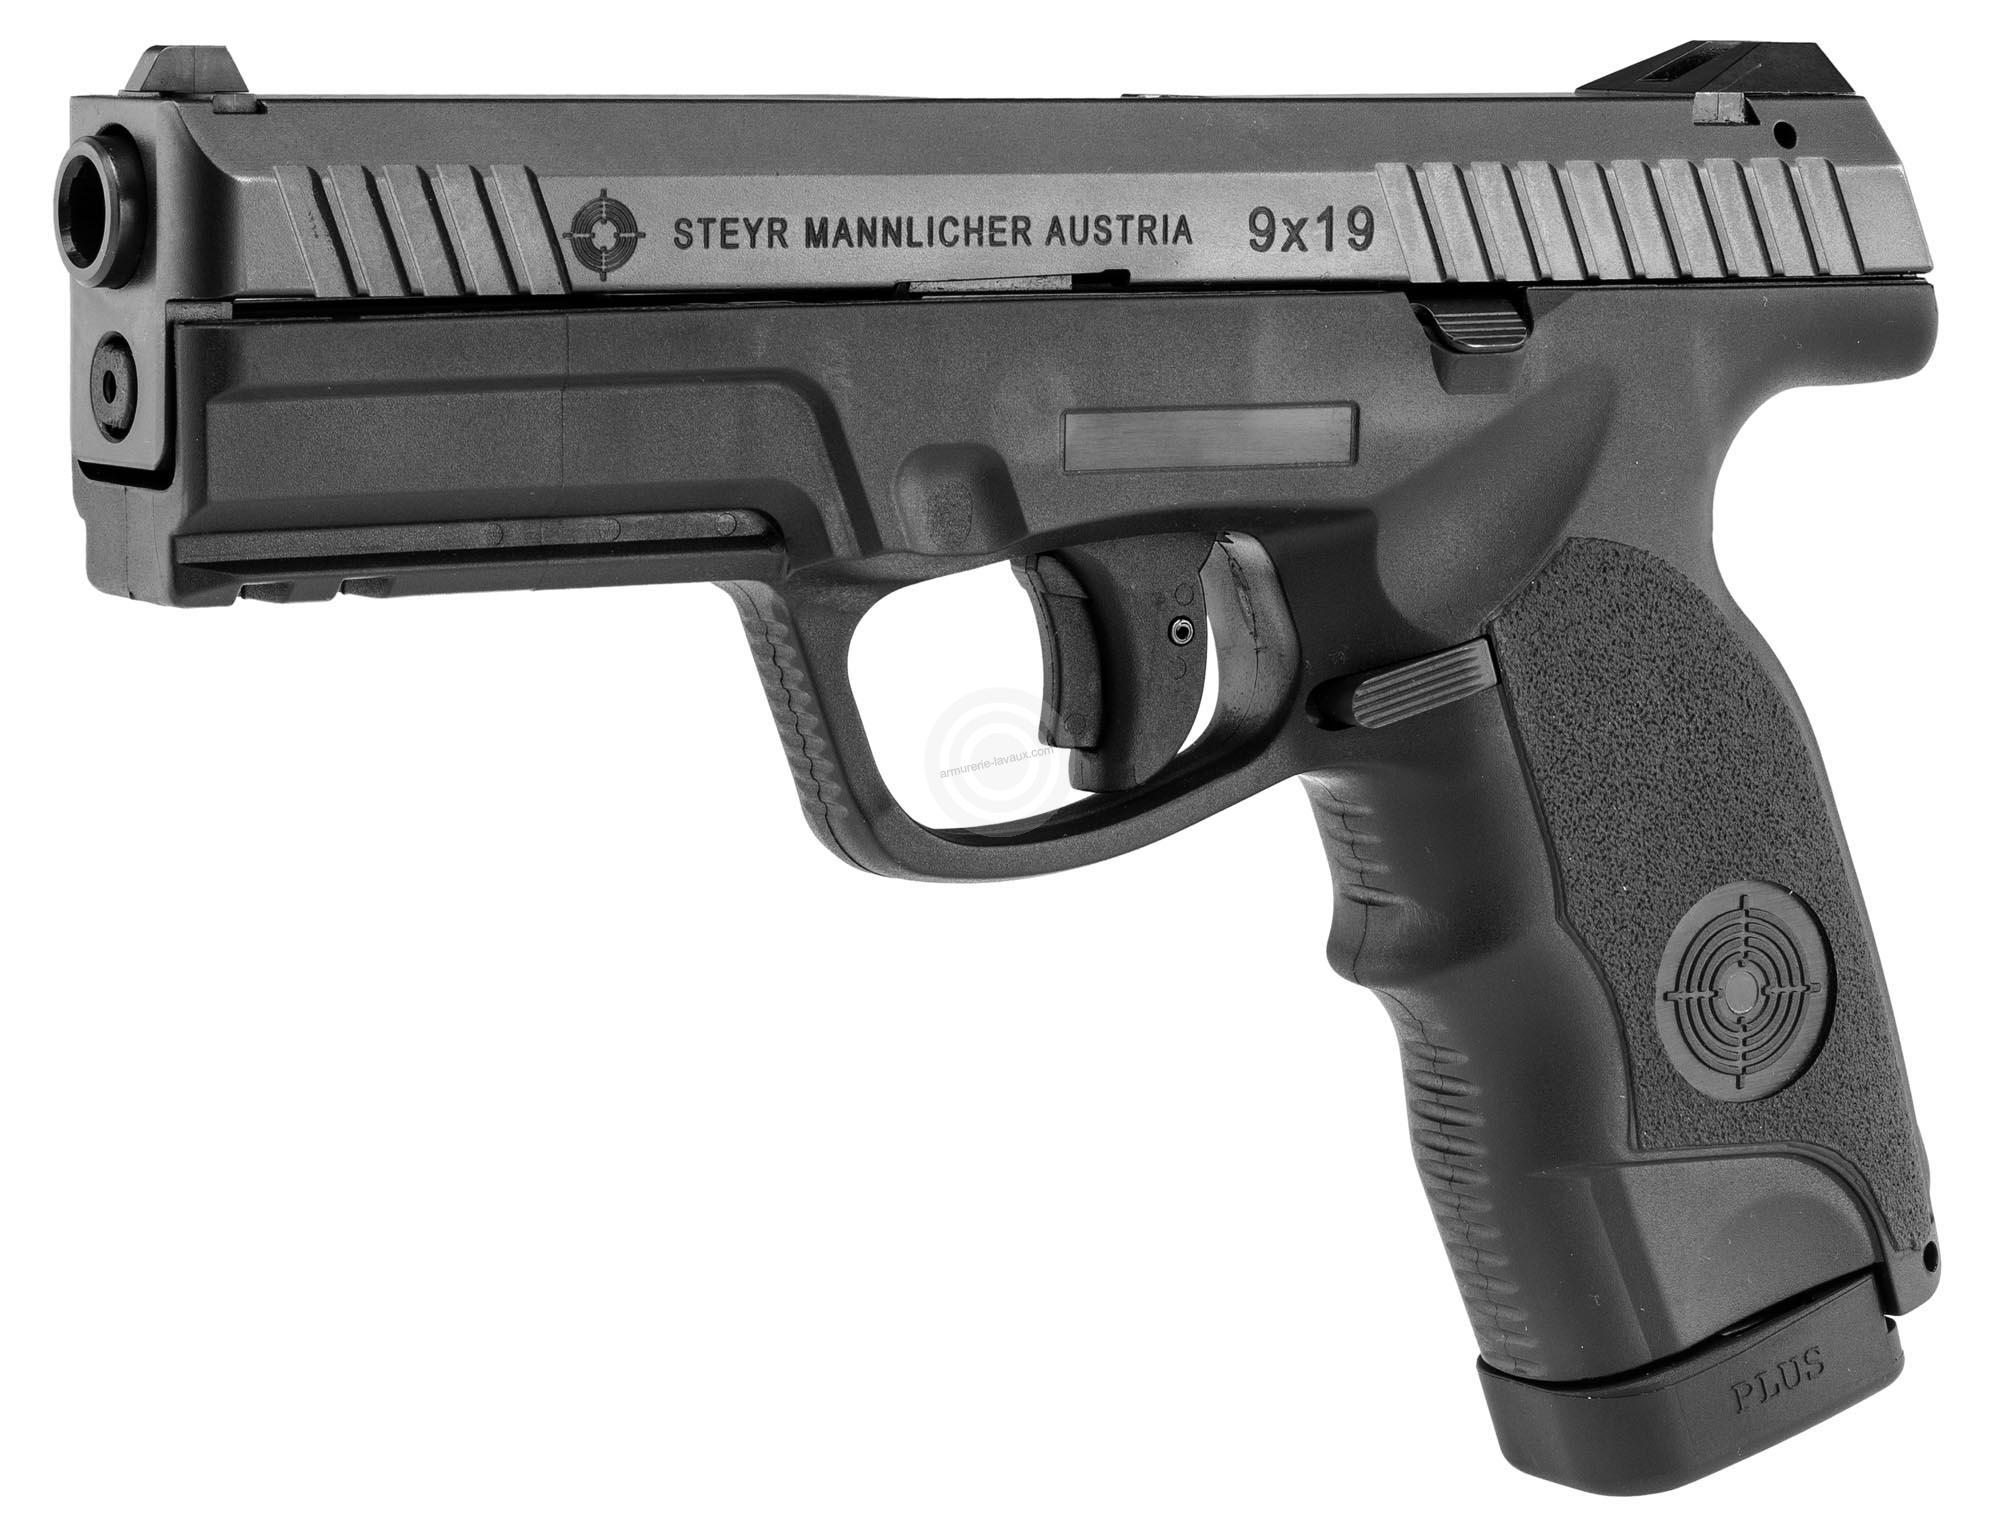 pistolet steyr l9